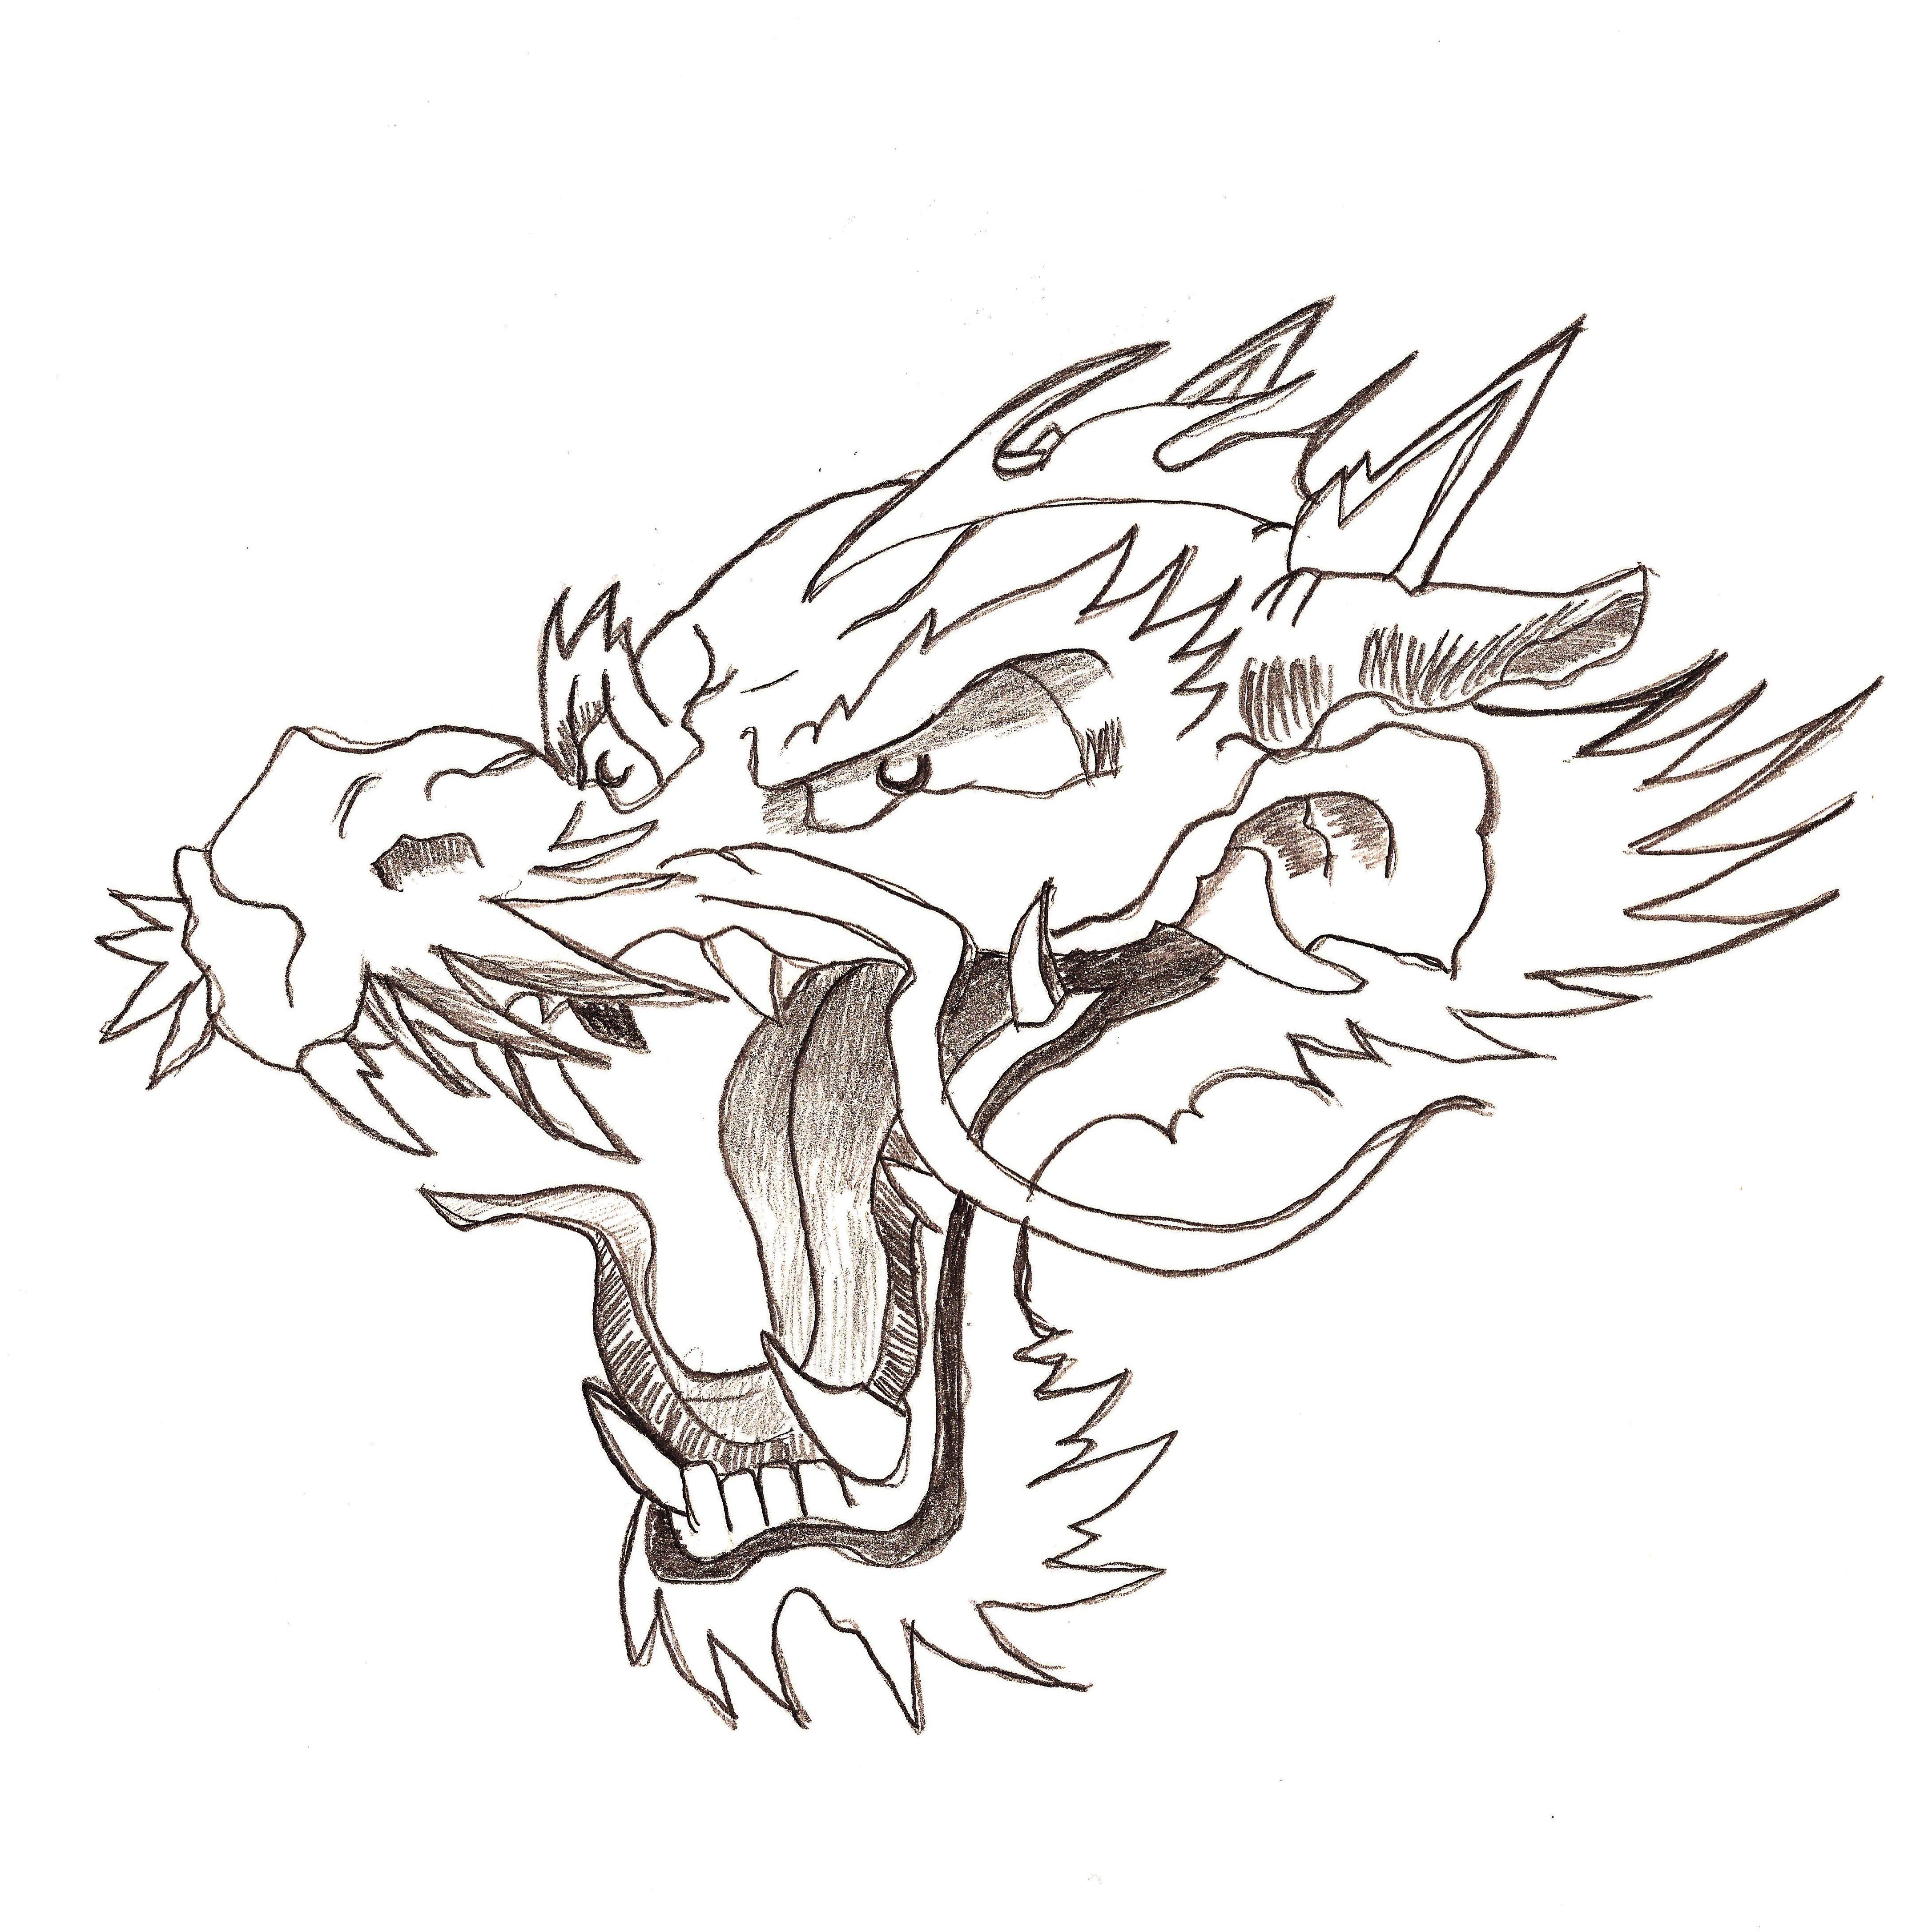 4344x4344 Japanese Dragon Head For Tattoo By Flegmaucigasa